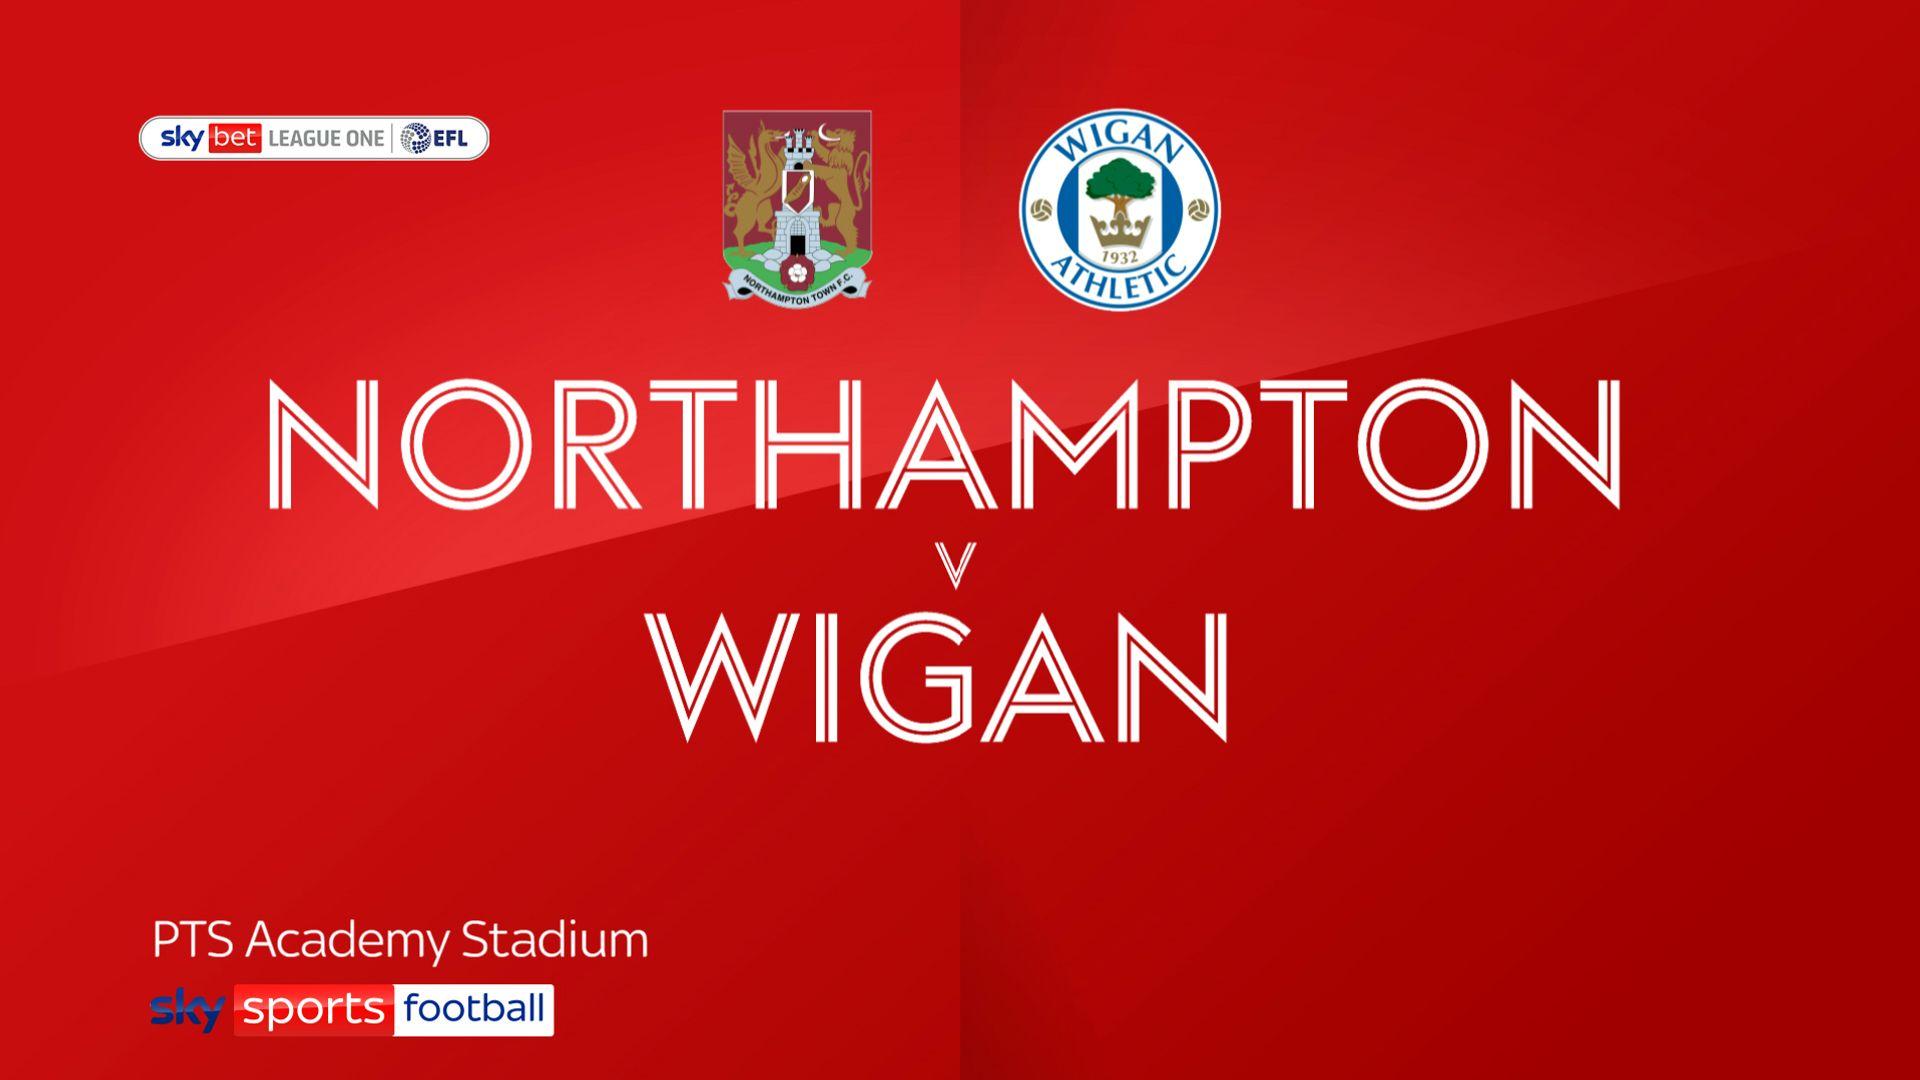 Lang strike earns crucial win for Wigan